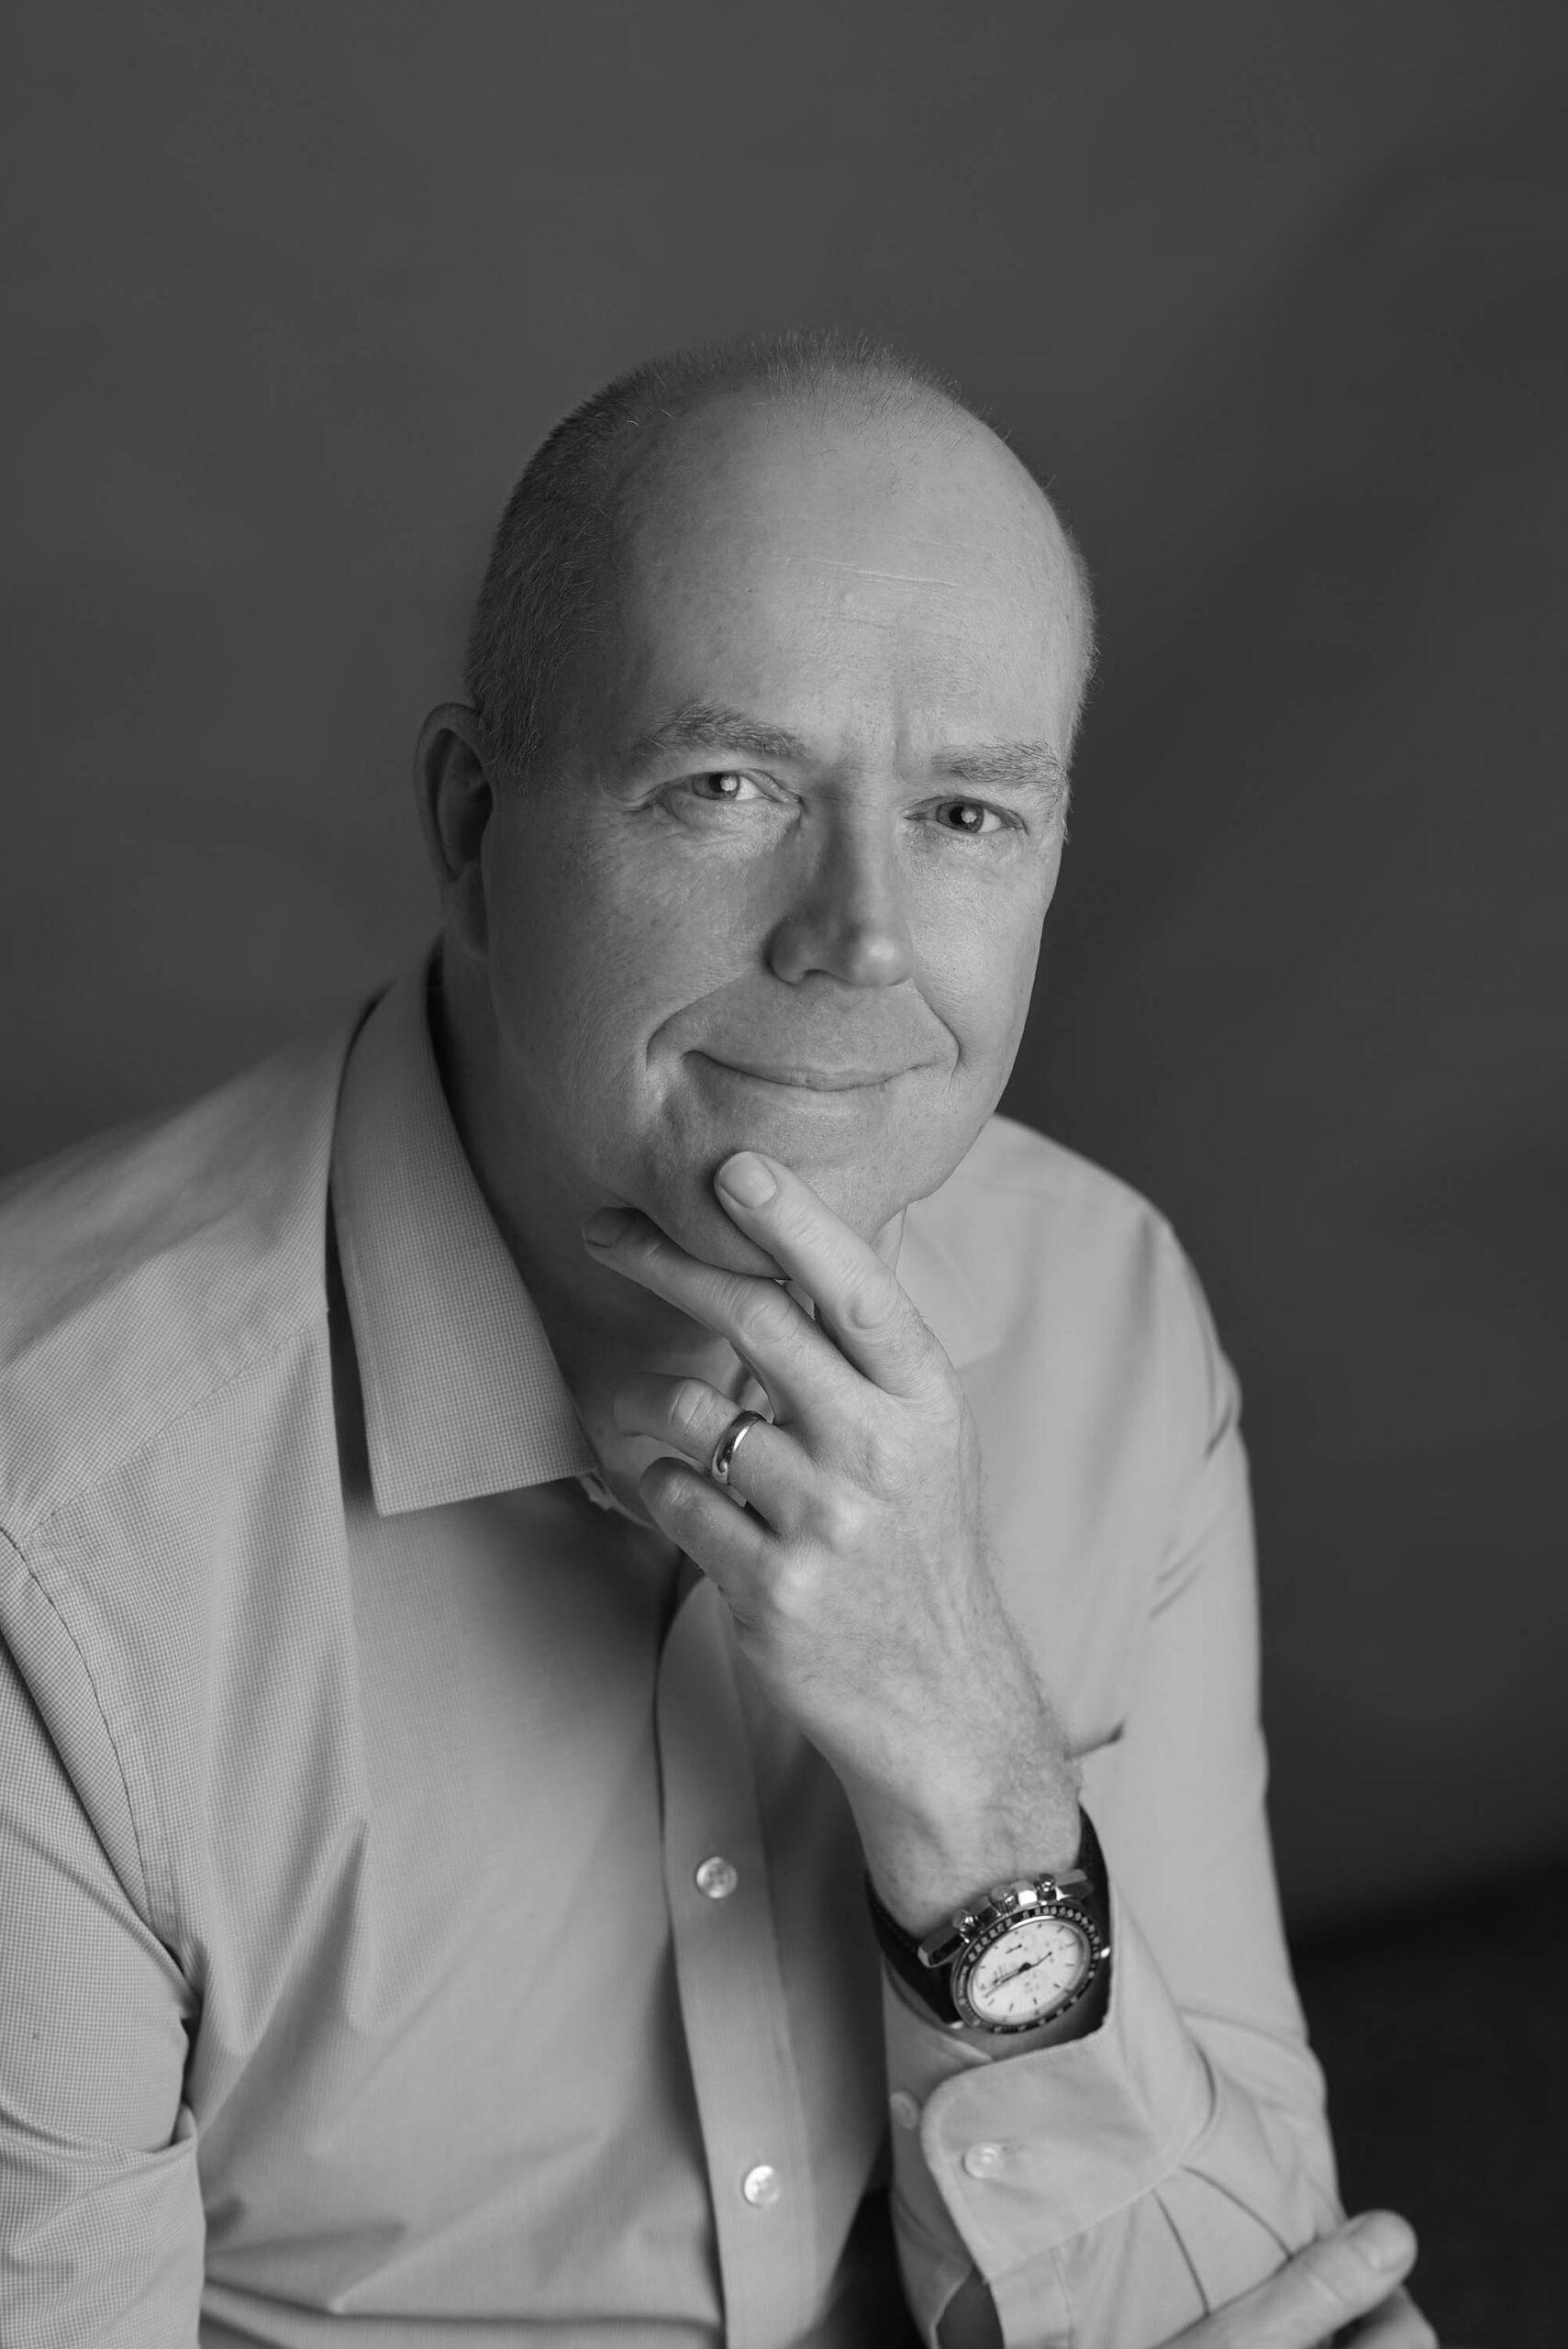 Chris Clarkson Hypnotherapist and Psychotherapist